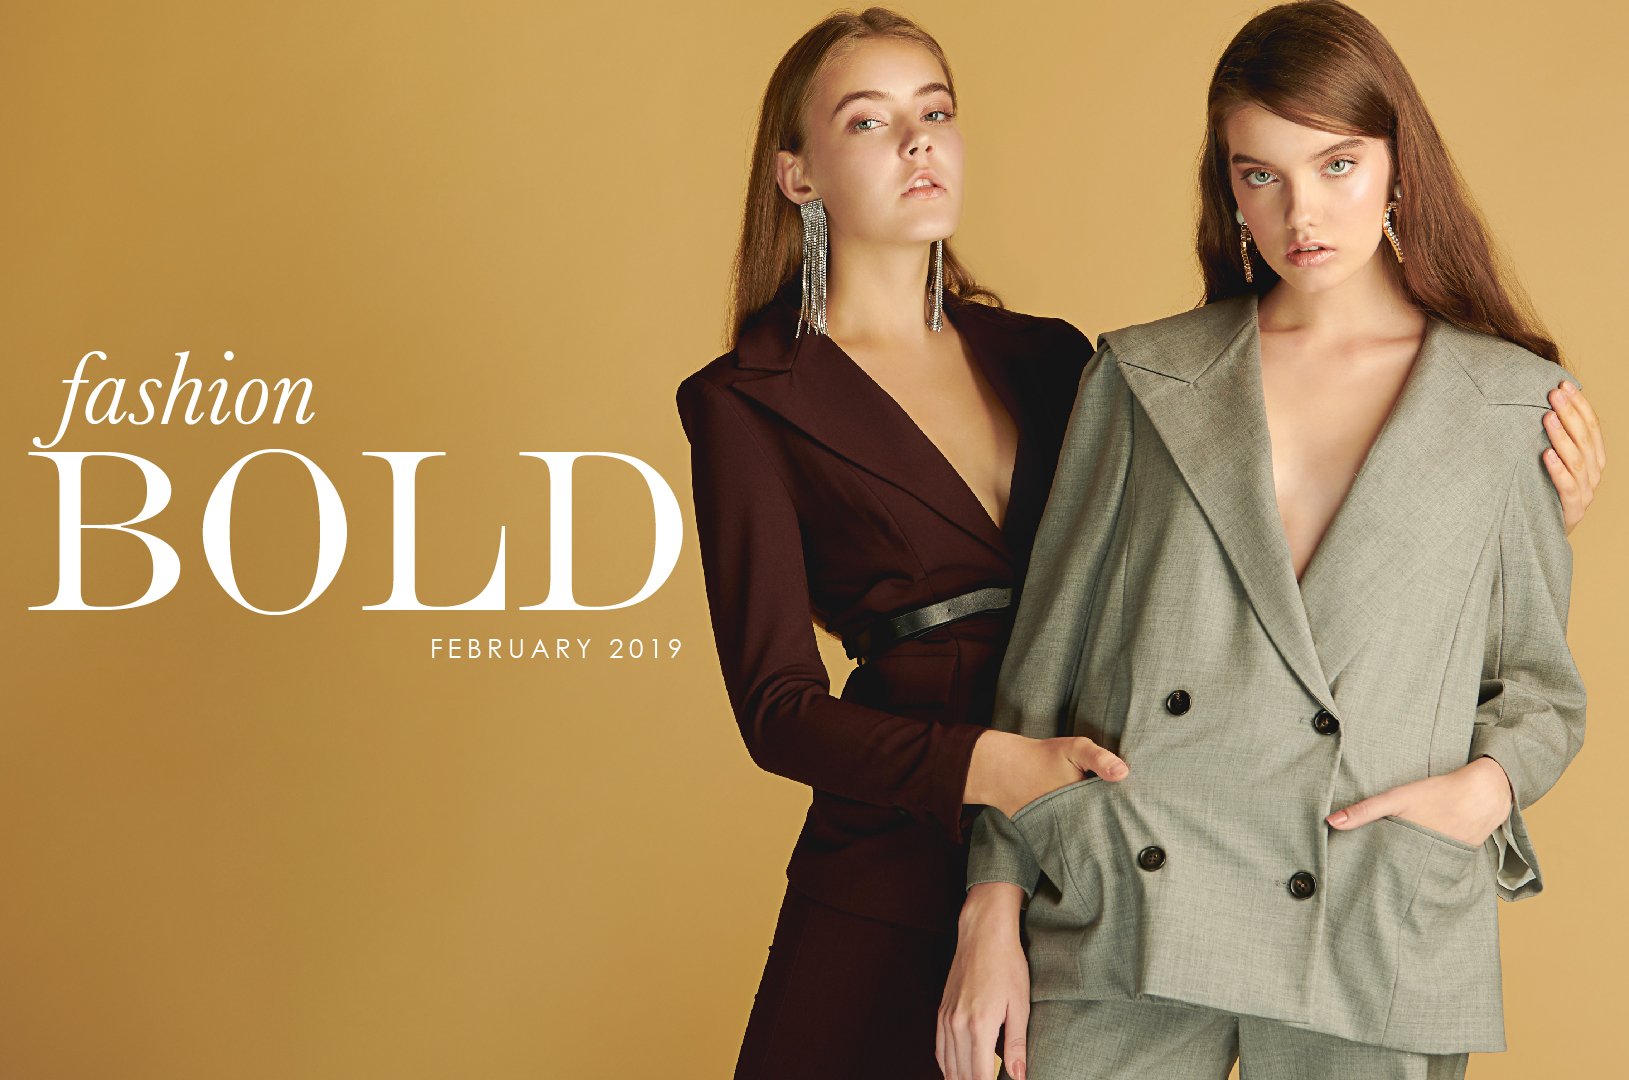 https://s3-ap-southeast-1.amazonaws.com/bchurunway/lookbook/fashion-bold/lookbook_fashion+Bold_edit+photo-02.jpg